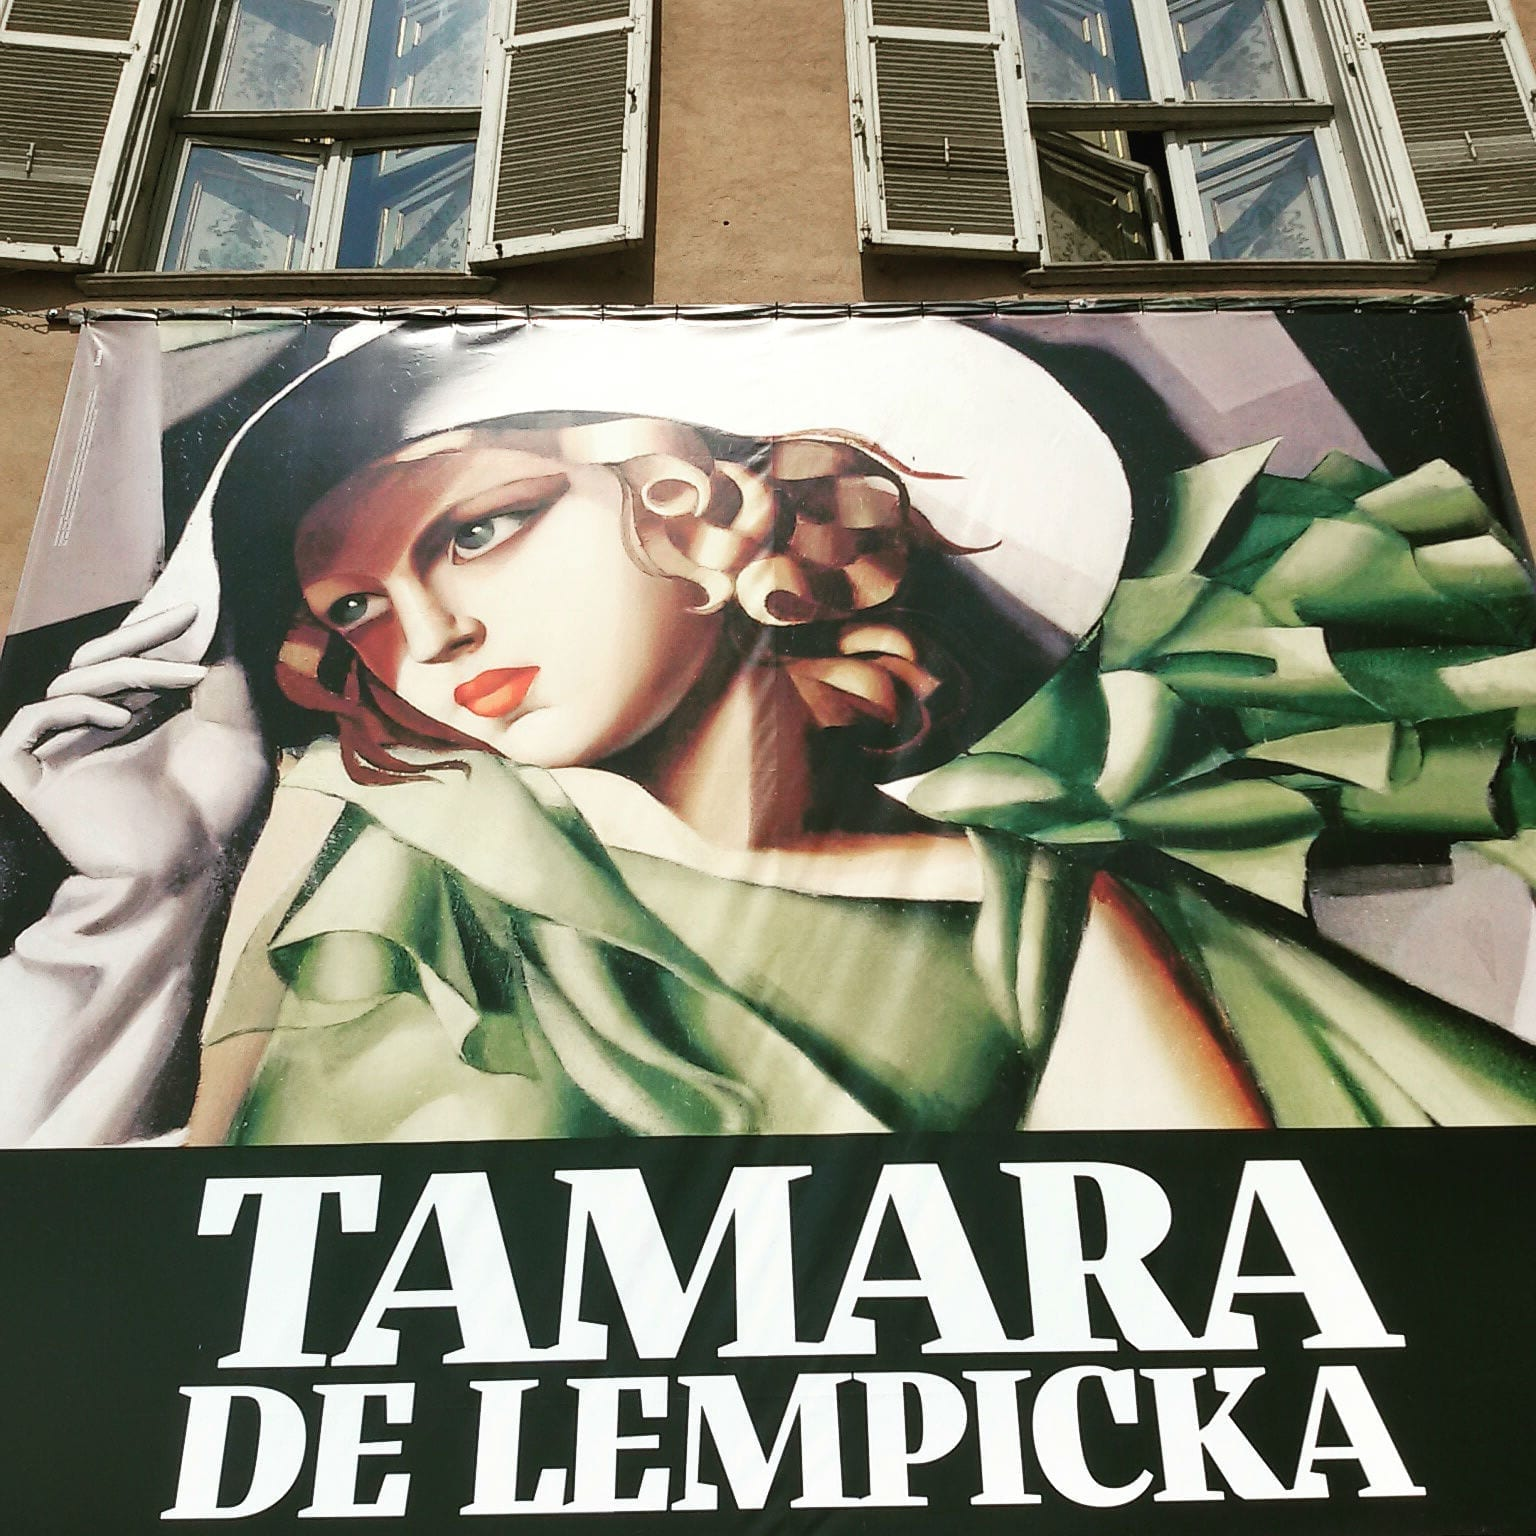 mostra tamara de lempicka verona, theladycracy.it, elisa bellino,, top fashion blogger italiane